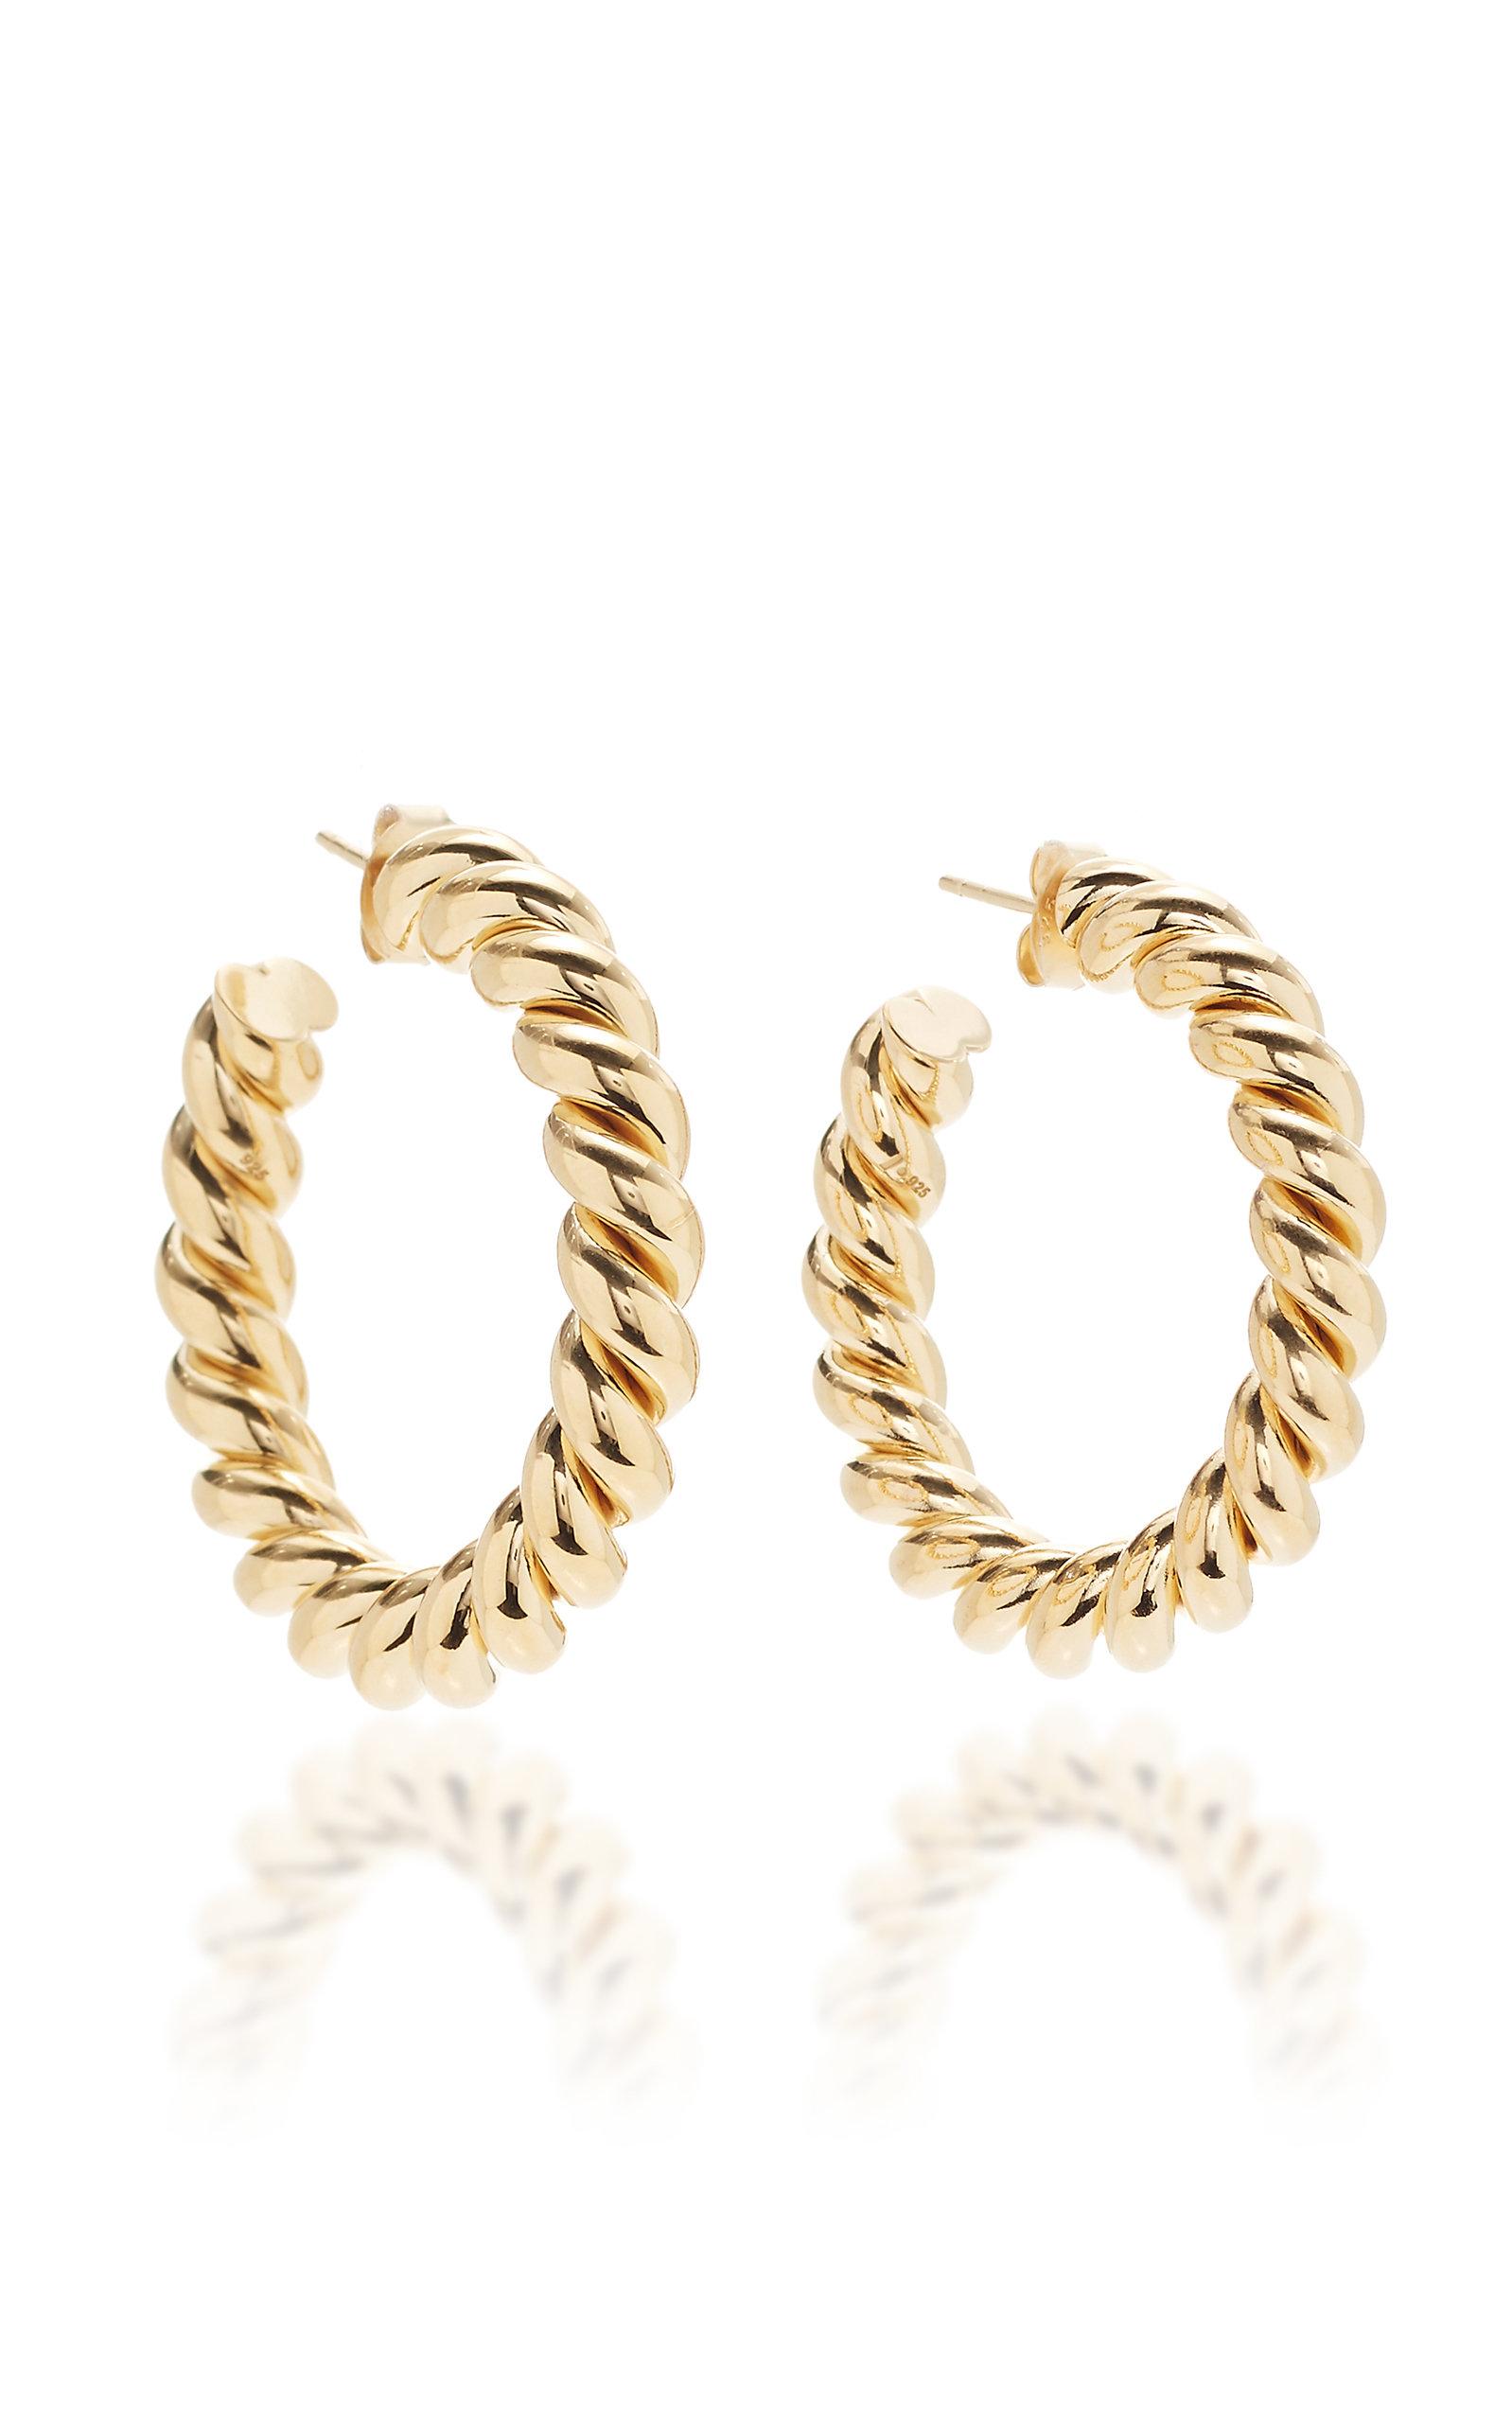 Women's Small Gold-Plated Hoop Earrings